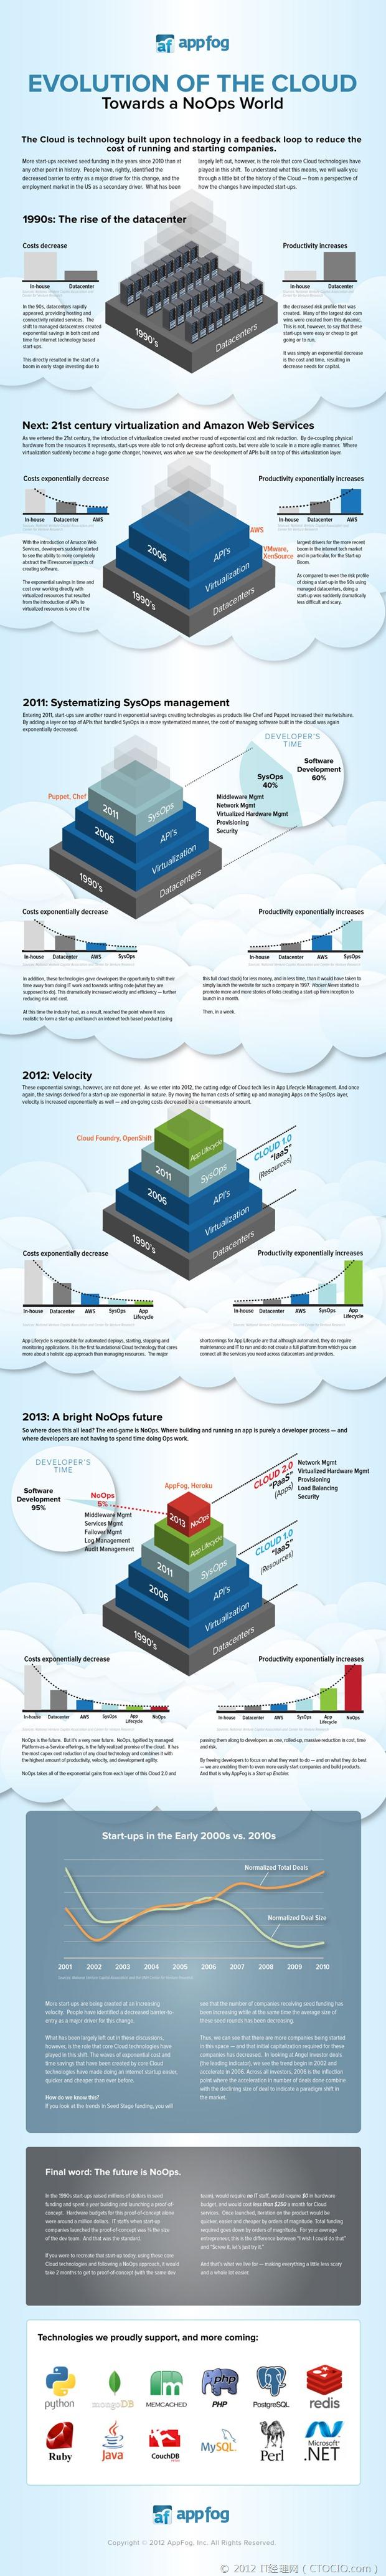 cloud-evolution-toward-noops